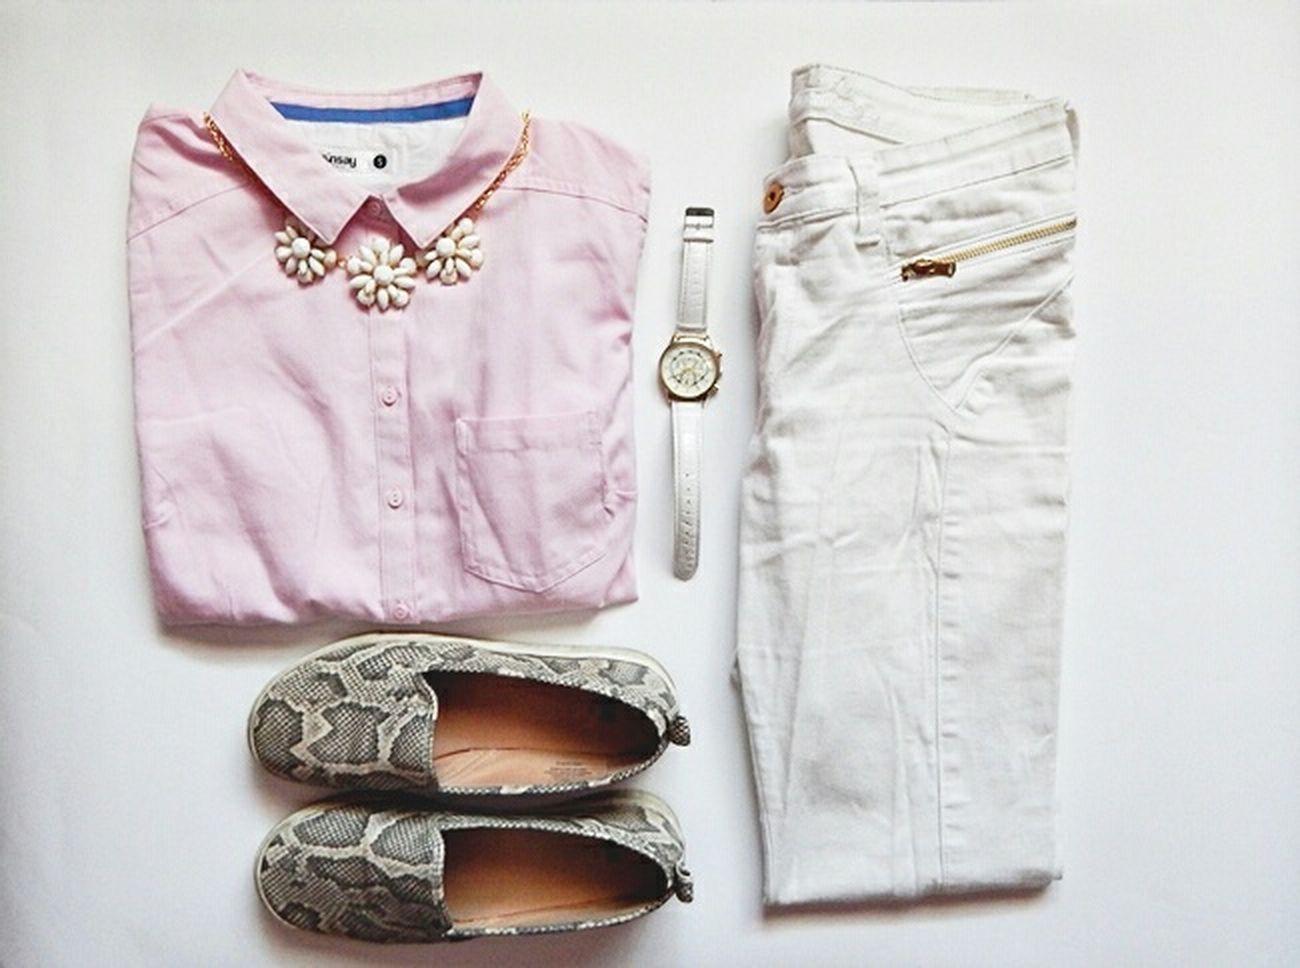 hrtp://iamallexandra.blogspot.com Fashion Clothes White Slipon Outfit